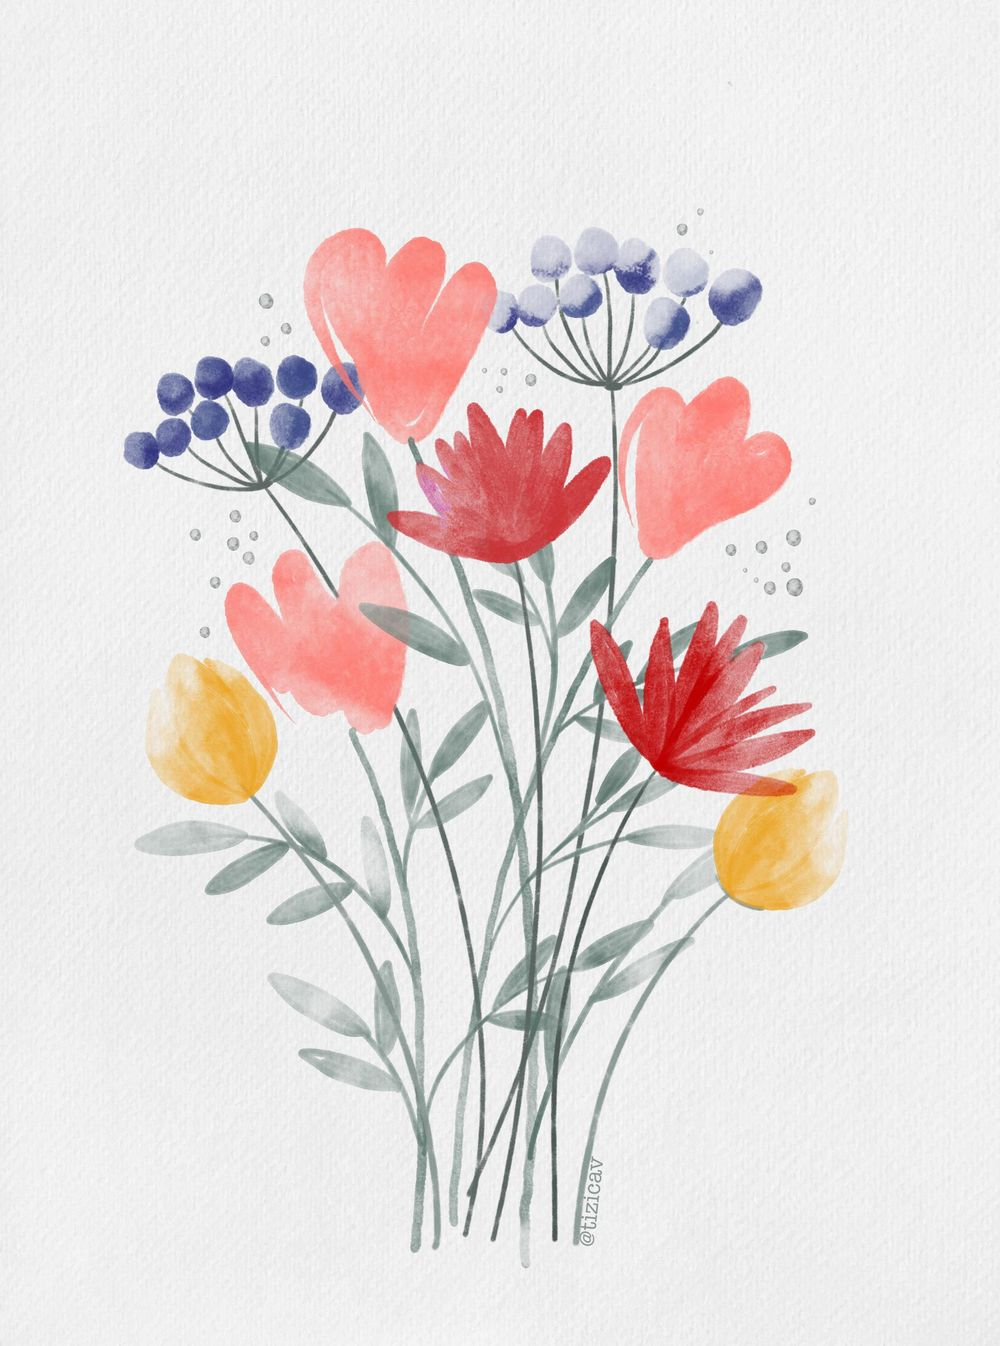 wild flowers garden - image 1 - student project